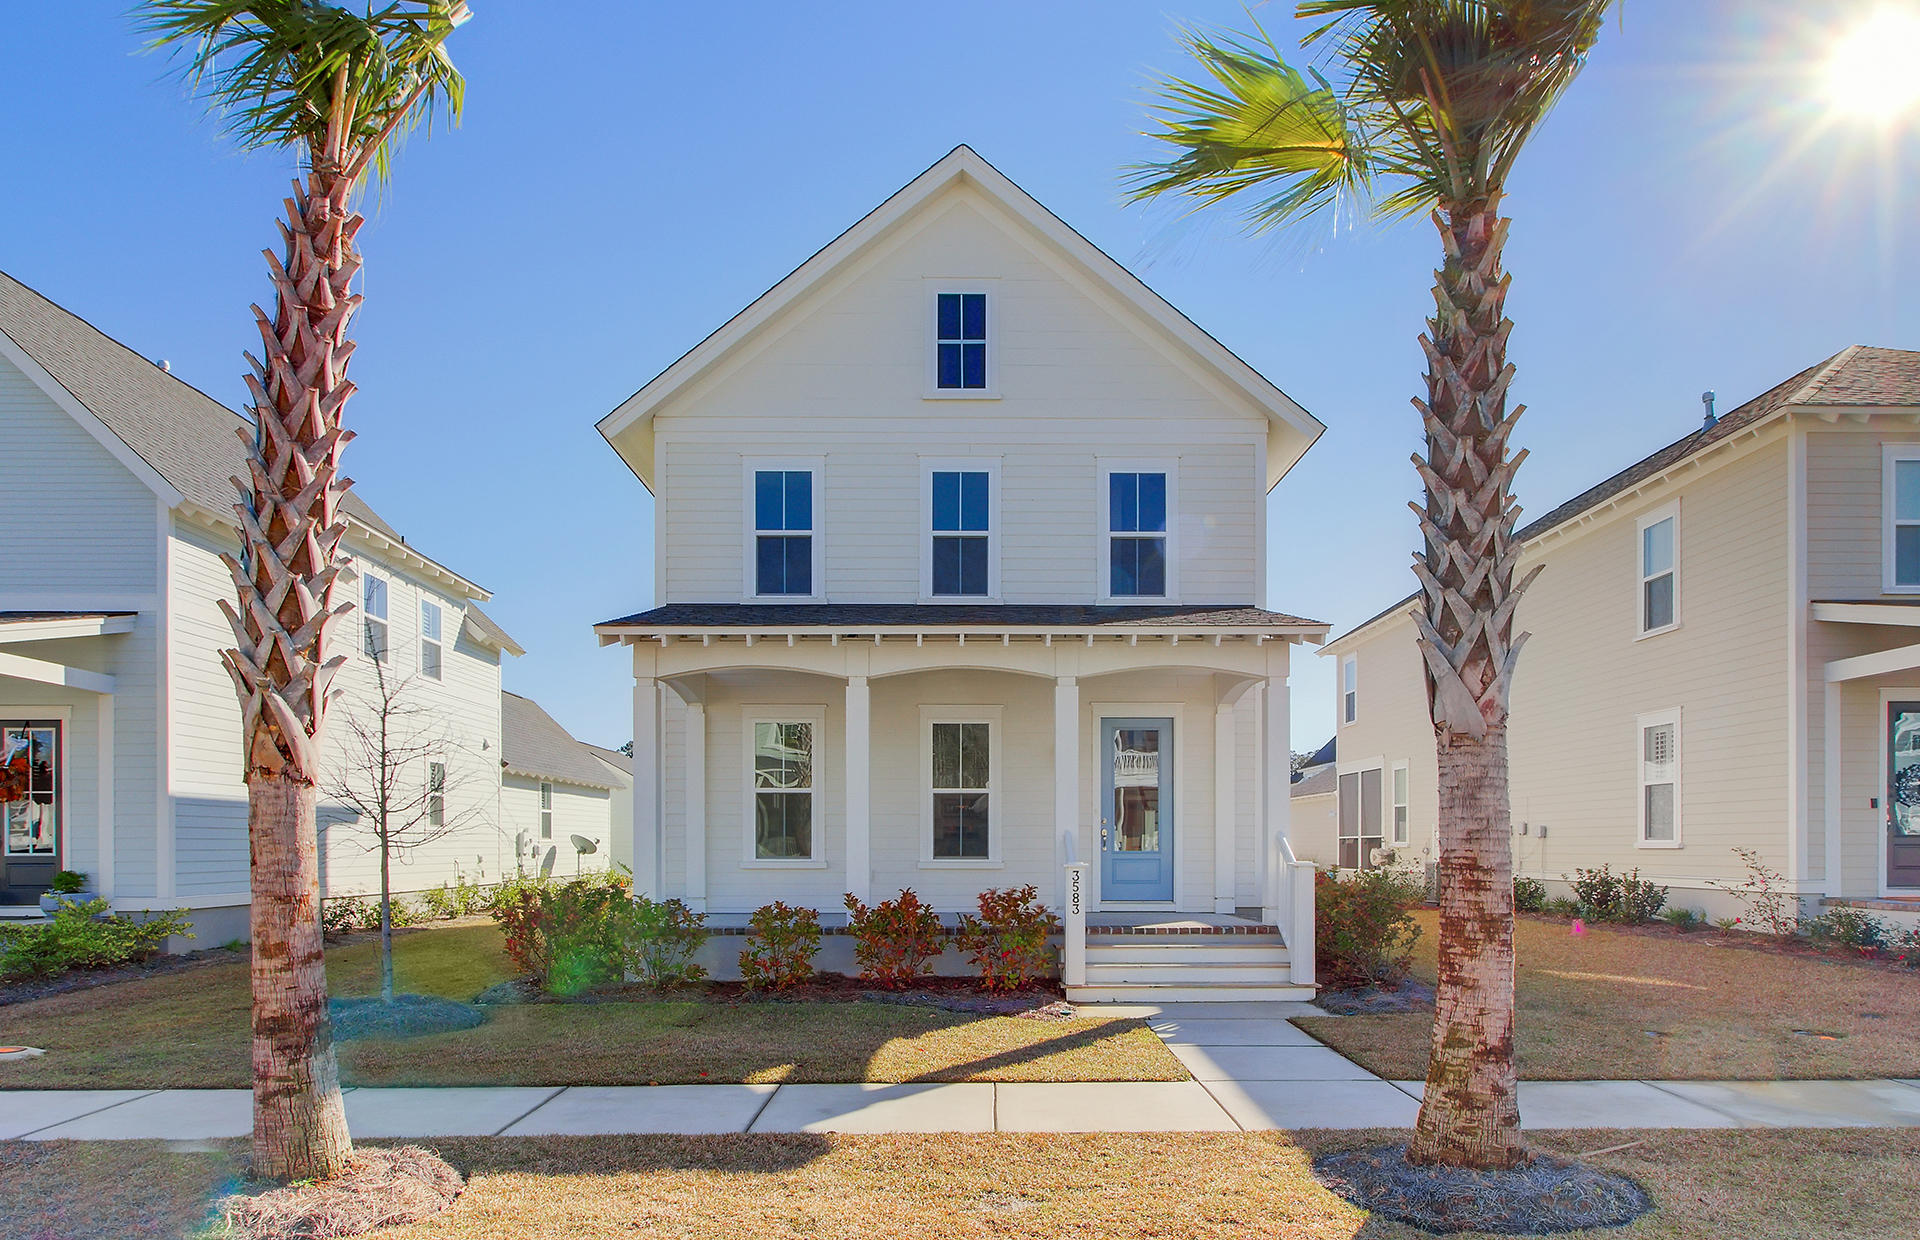 Carolina Park Homes For Sale - 3583 Backshore, Mount Pleasant, SC - 1